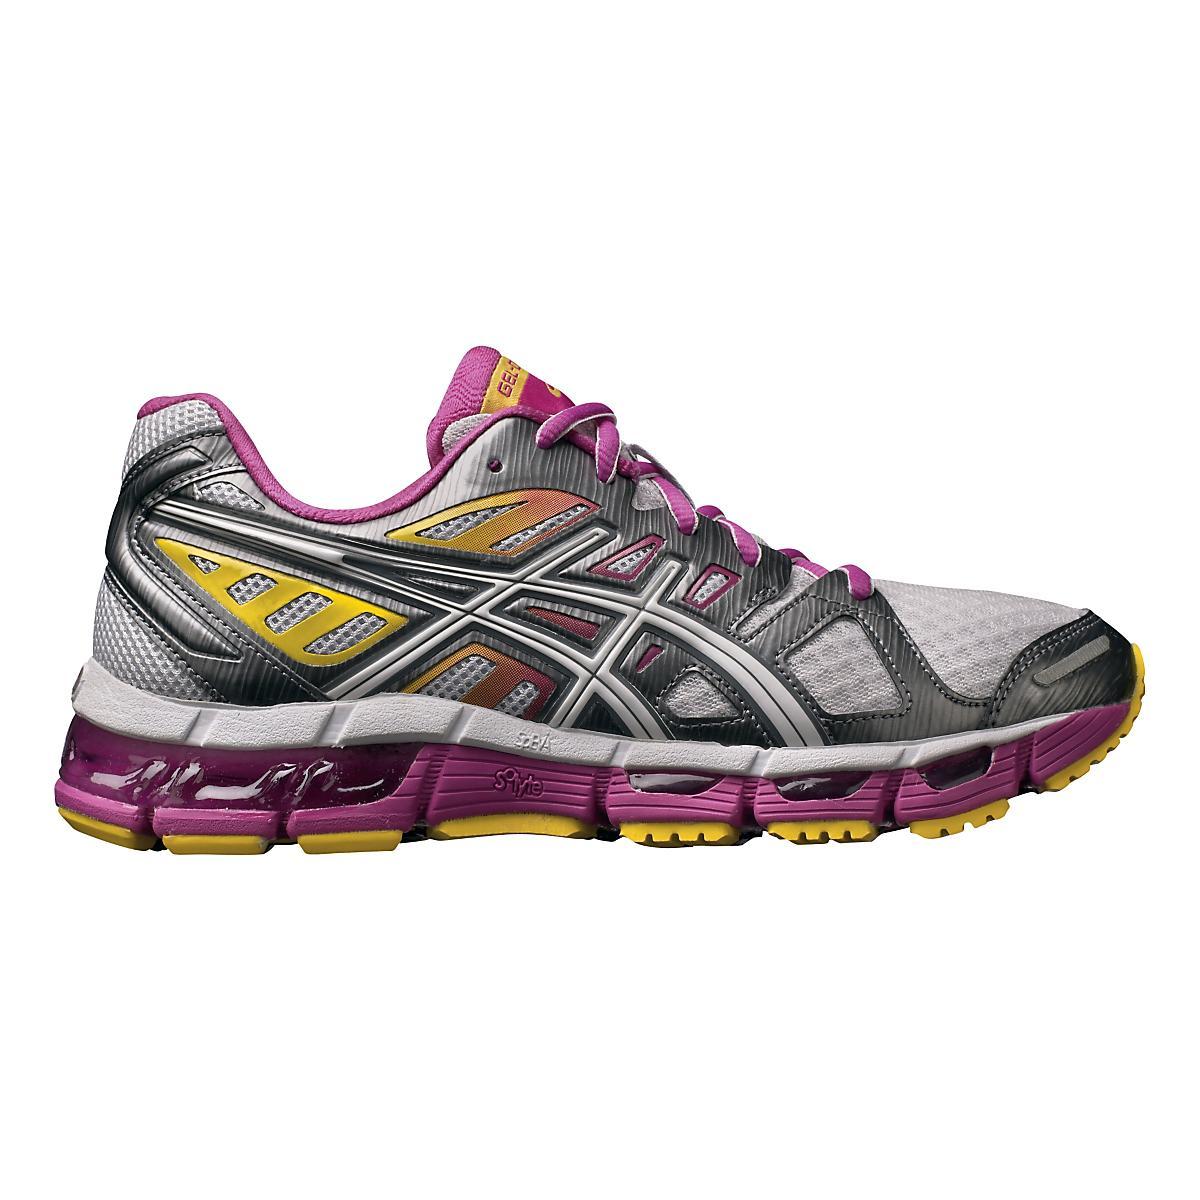 70033b067c7c Womens ASICS GEL-Cirrus33 2 Running Shoe at Road Runner Sports